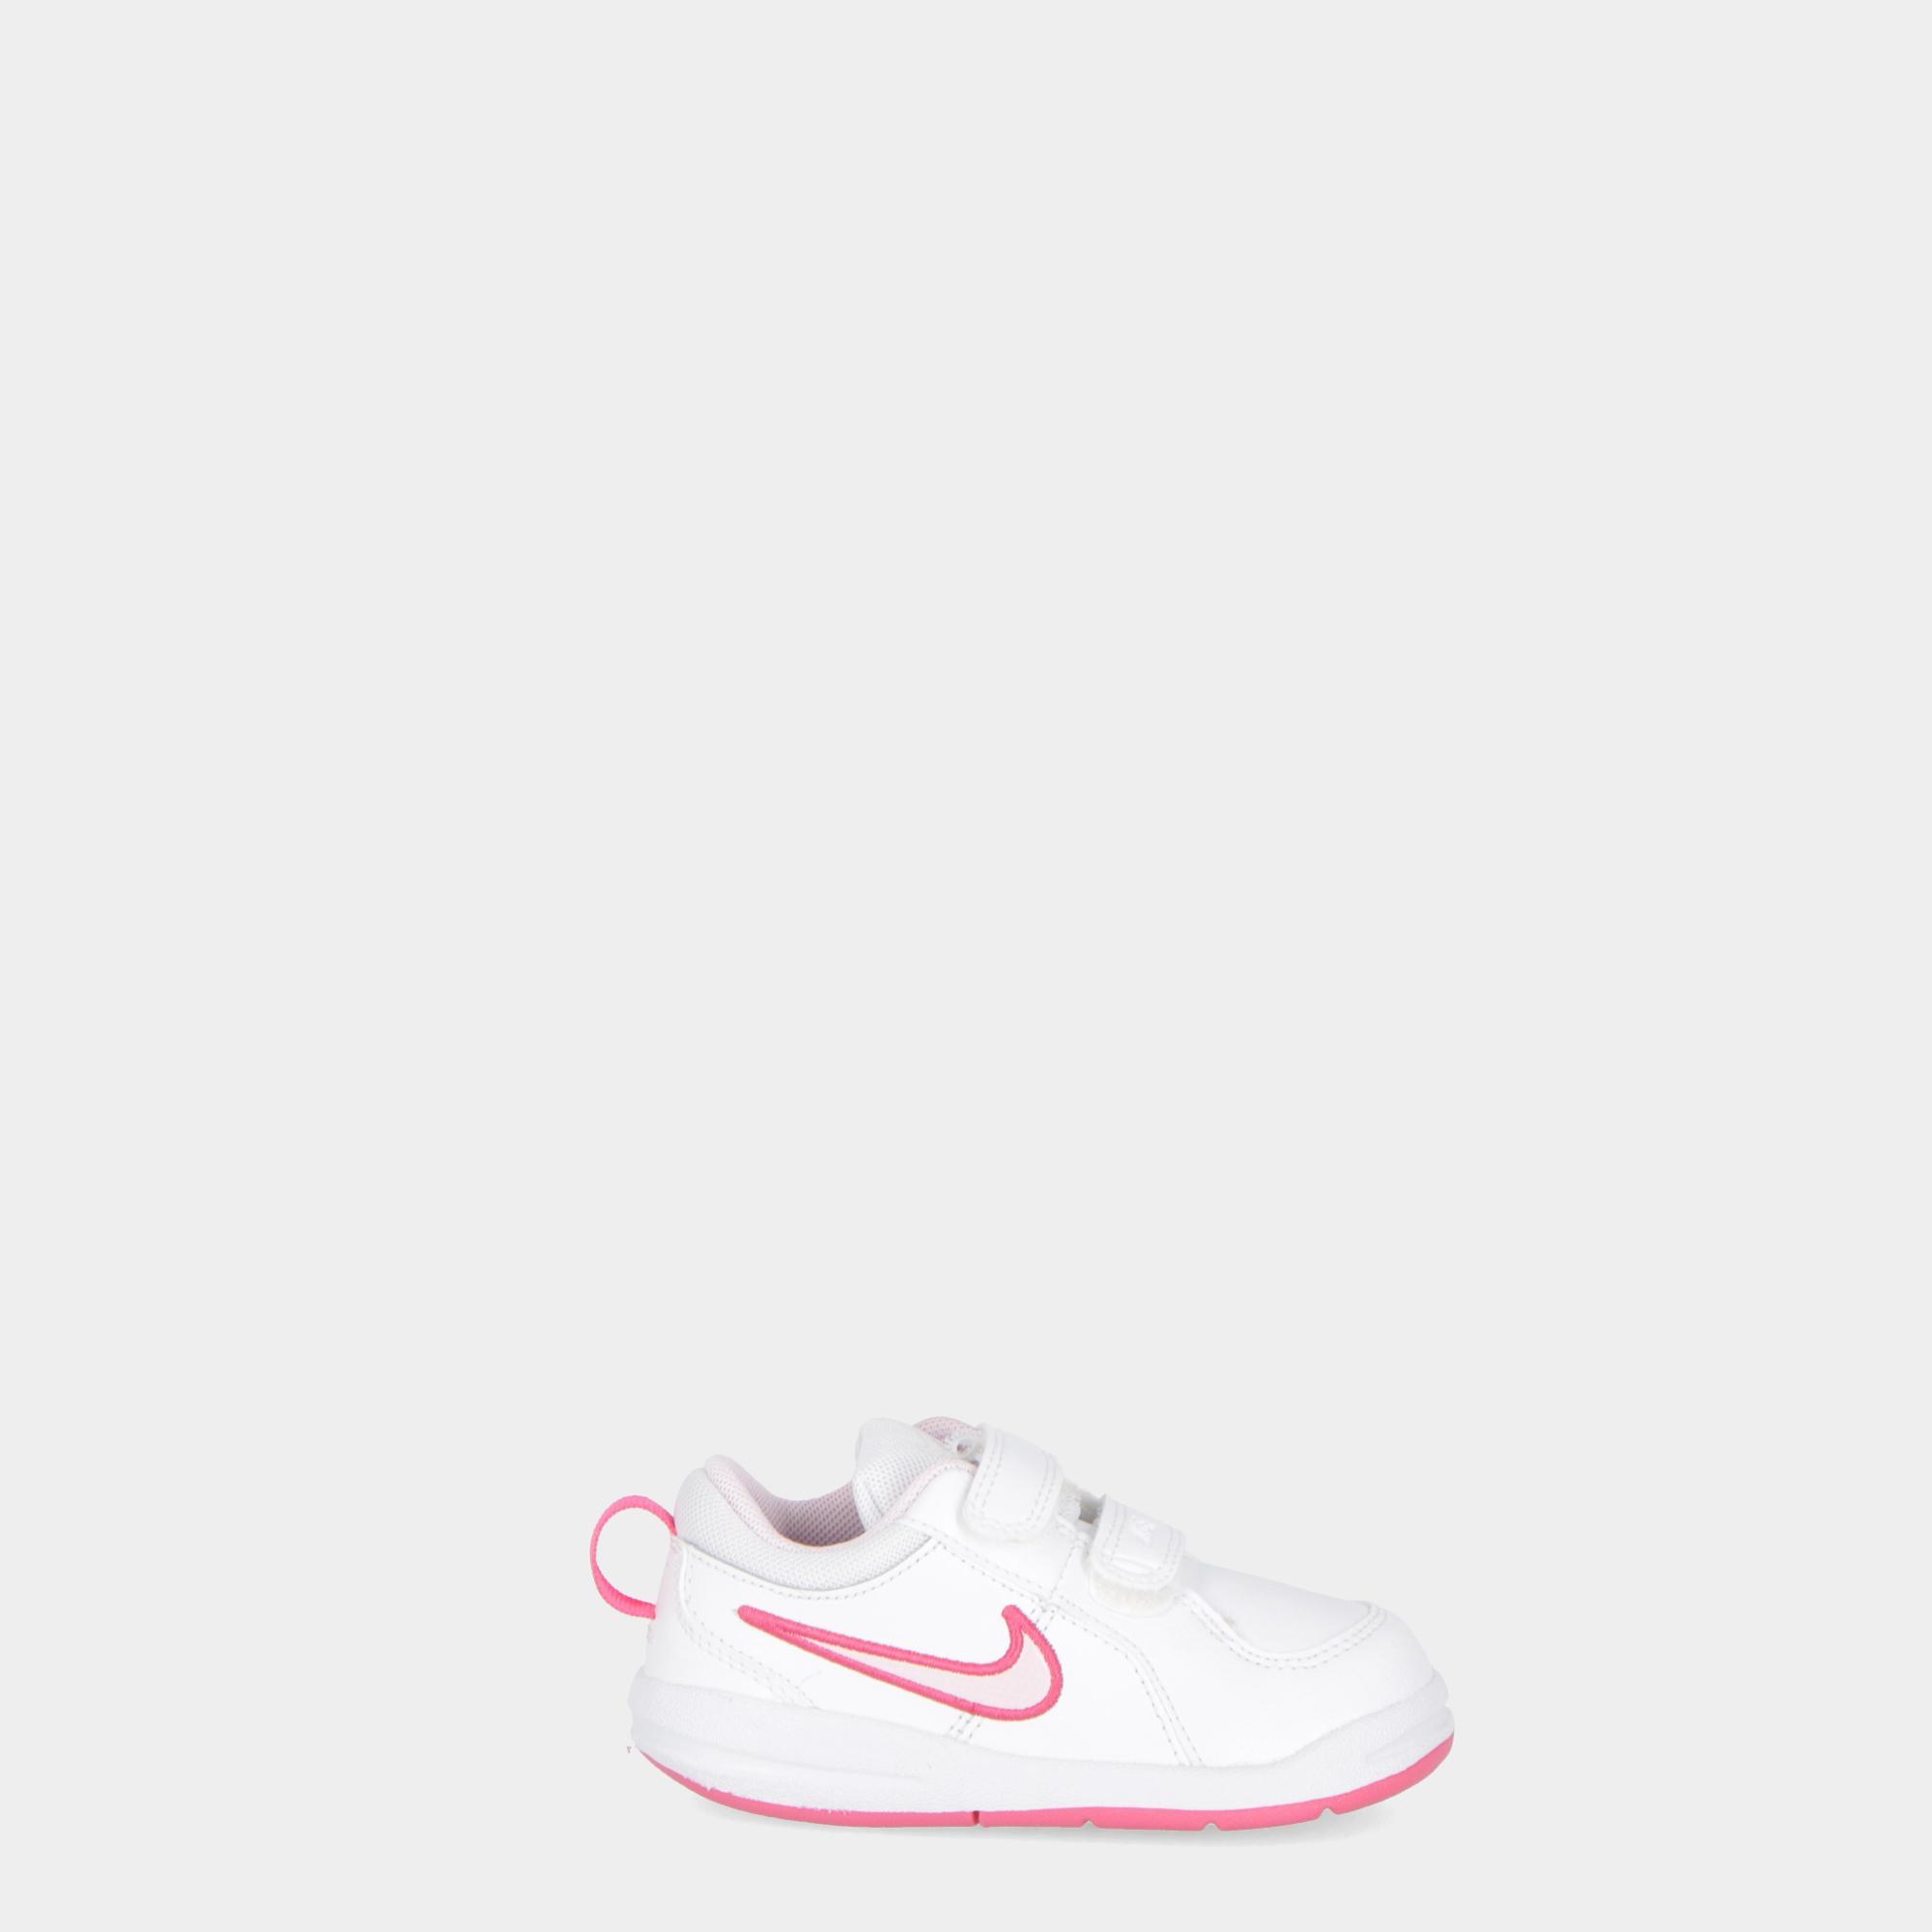 59074c86373f2 Nike Pico 4 (tdv) - Kids White pink